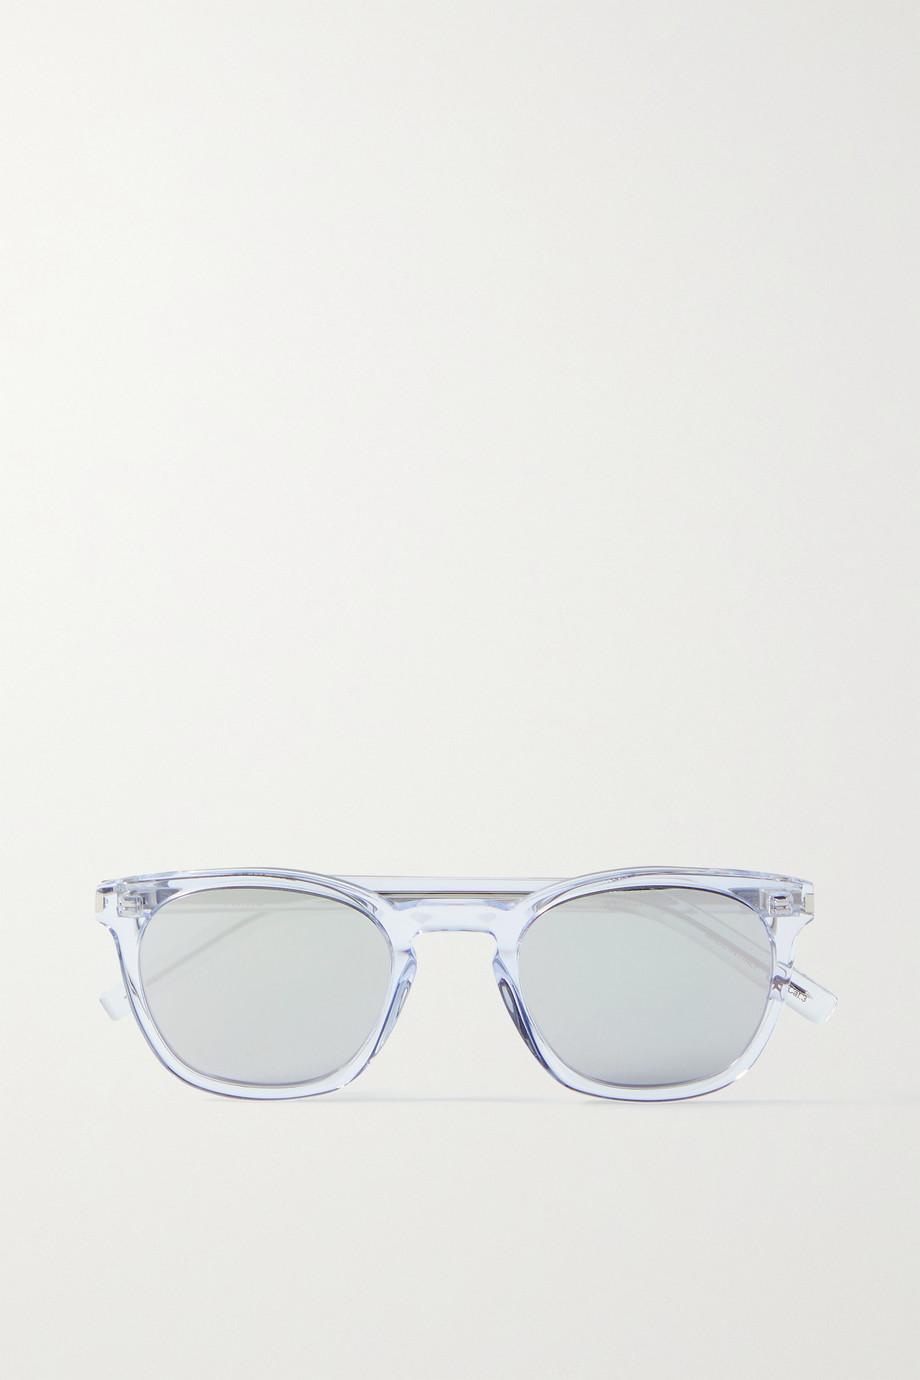 SAINT LAURENT D-frame acetate mirrored sunglasses